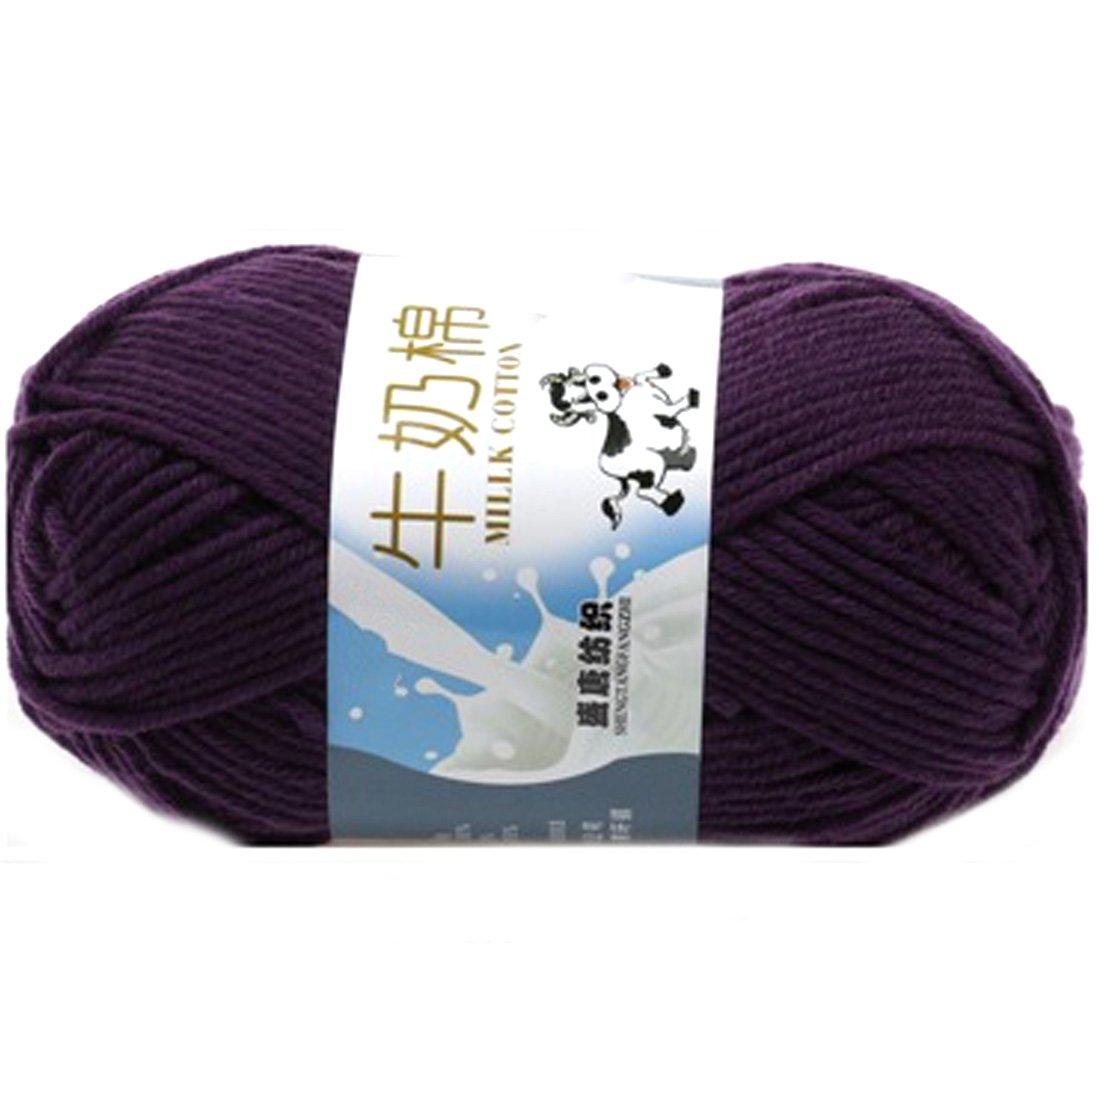 Smooth Cotton Natural Hand Knitting Wool Yarn Ball Baby Wool Craft-Dark Purple Fashion?Life